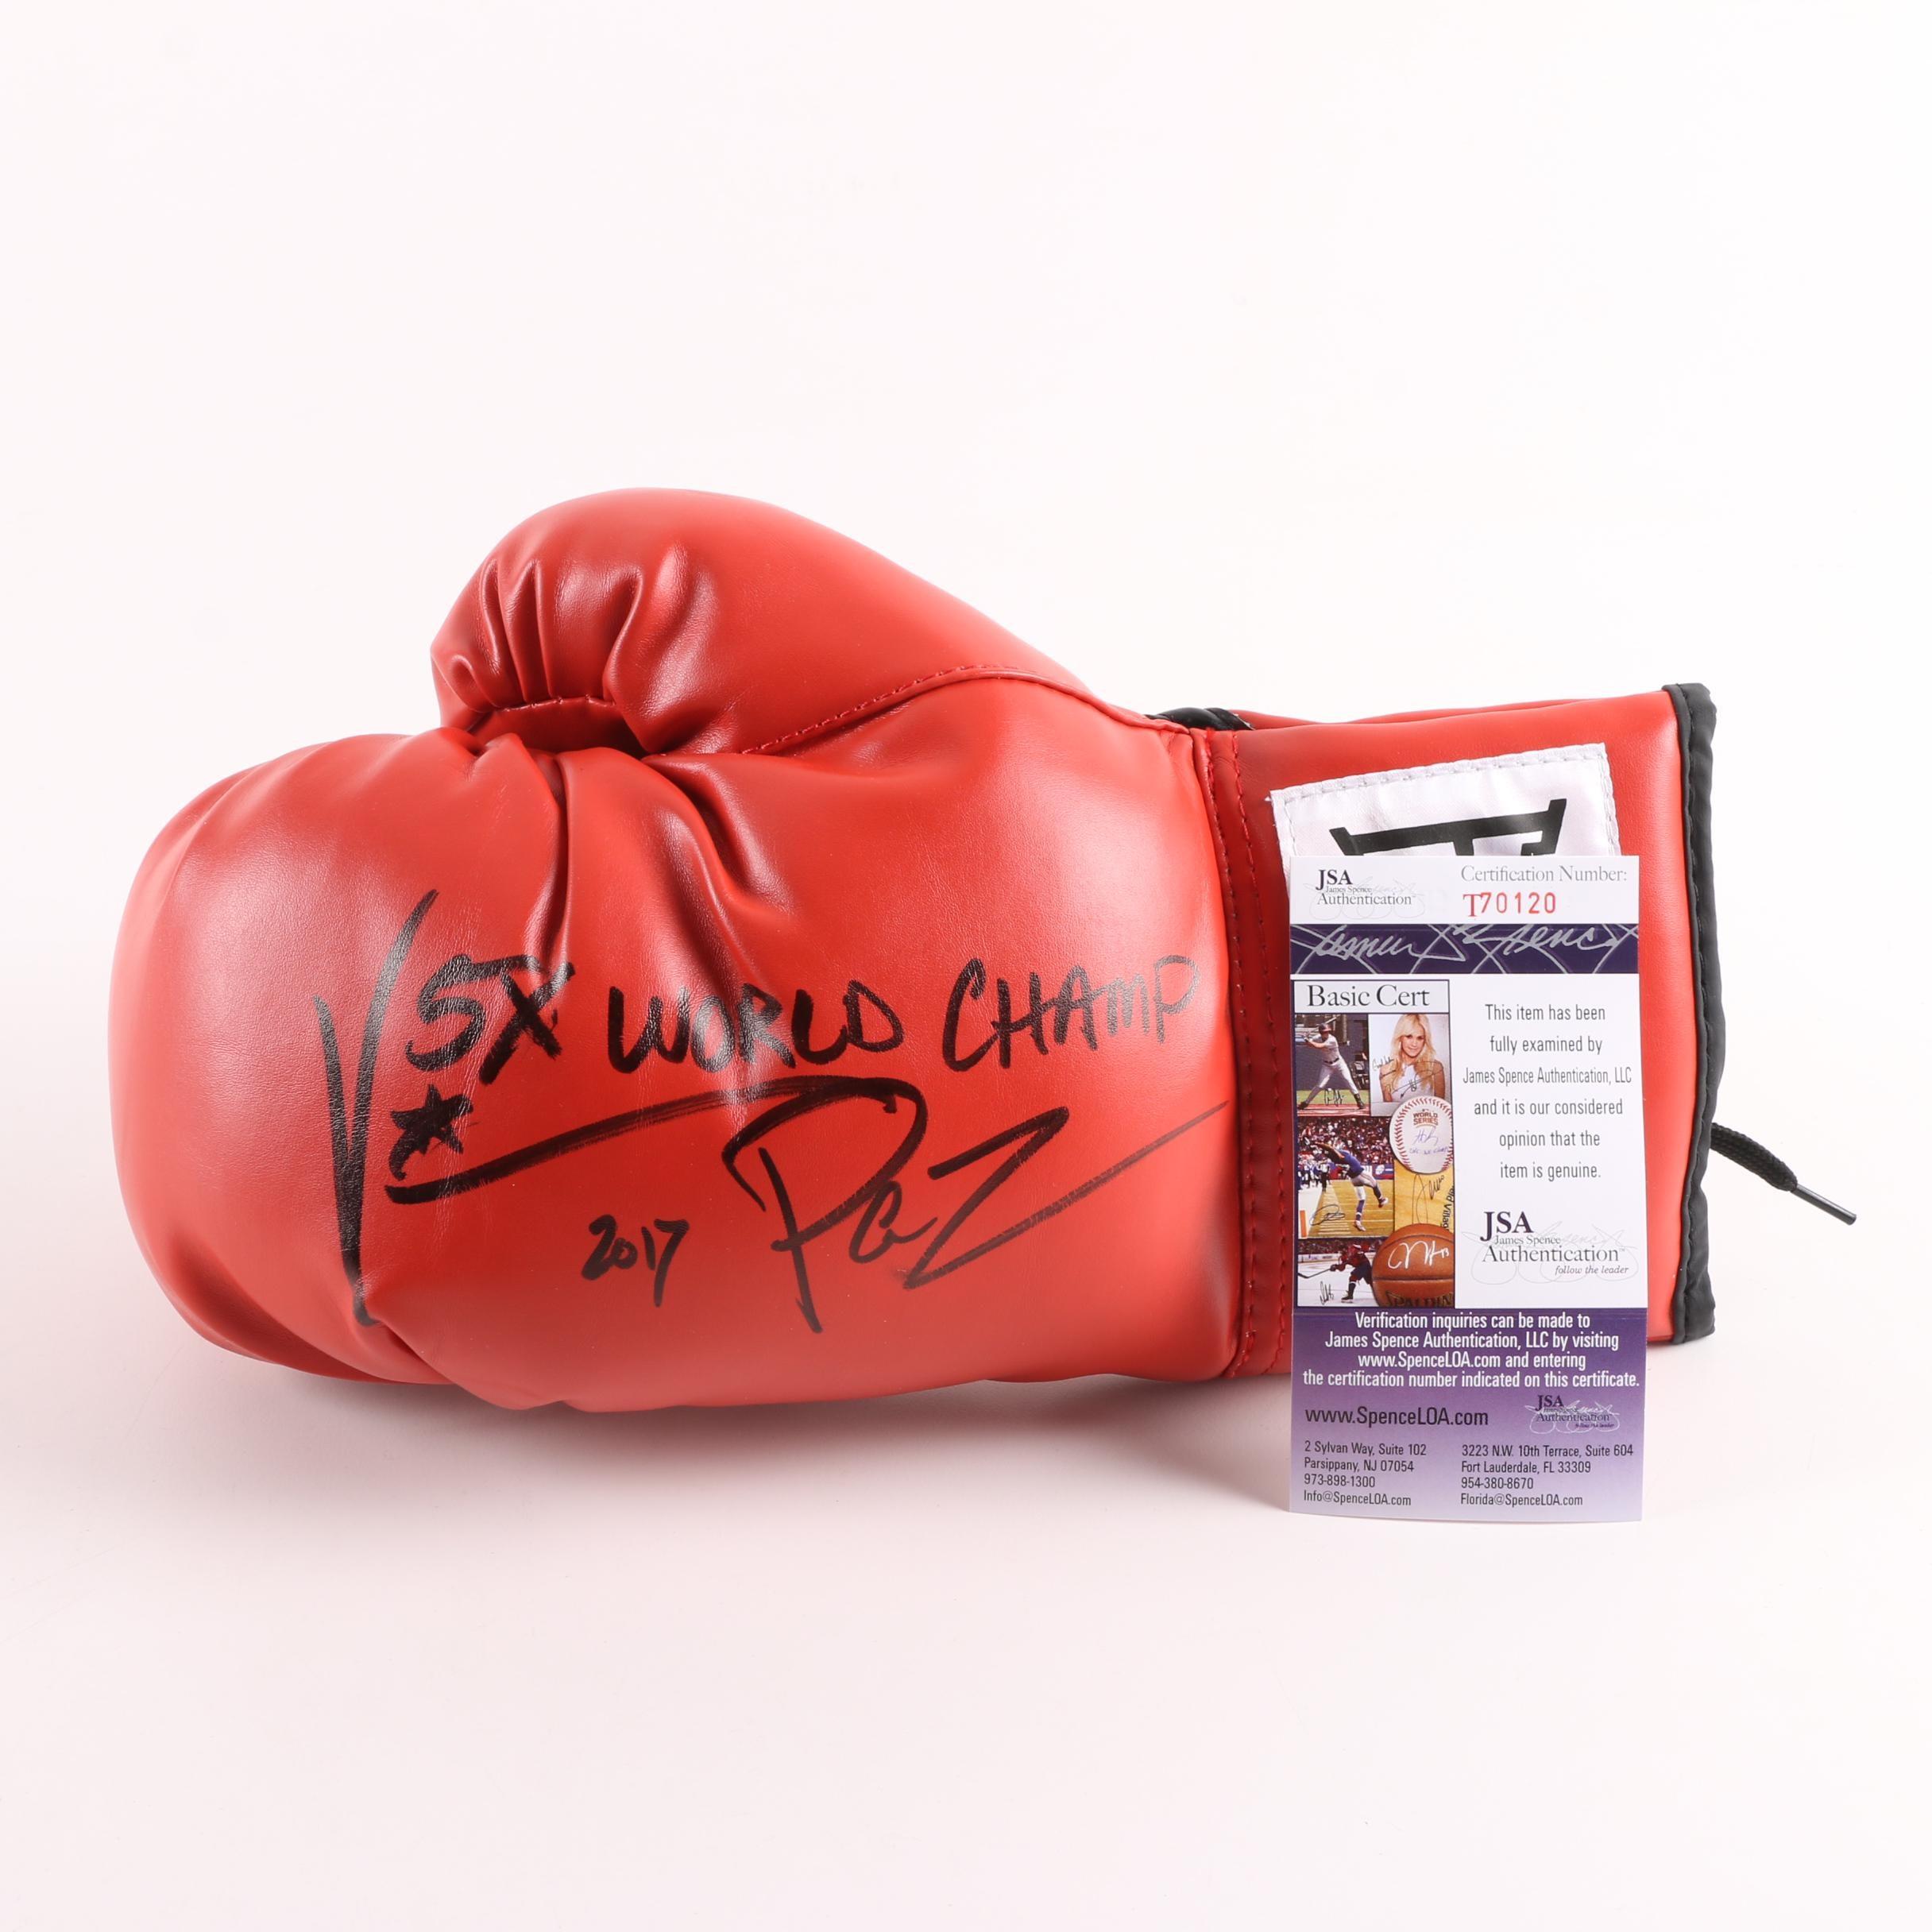 Vinny Paz Autographed Boxing Glove - JSA COA